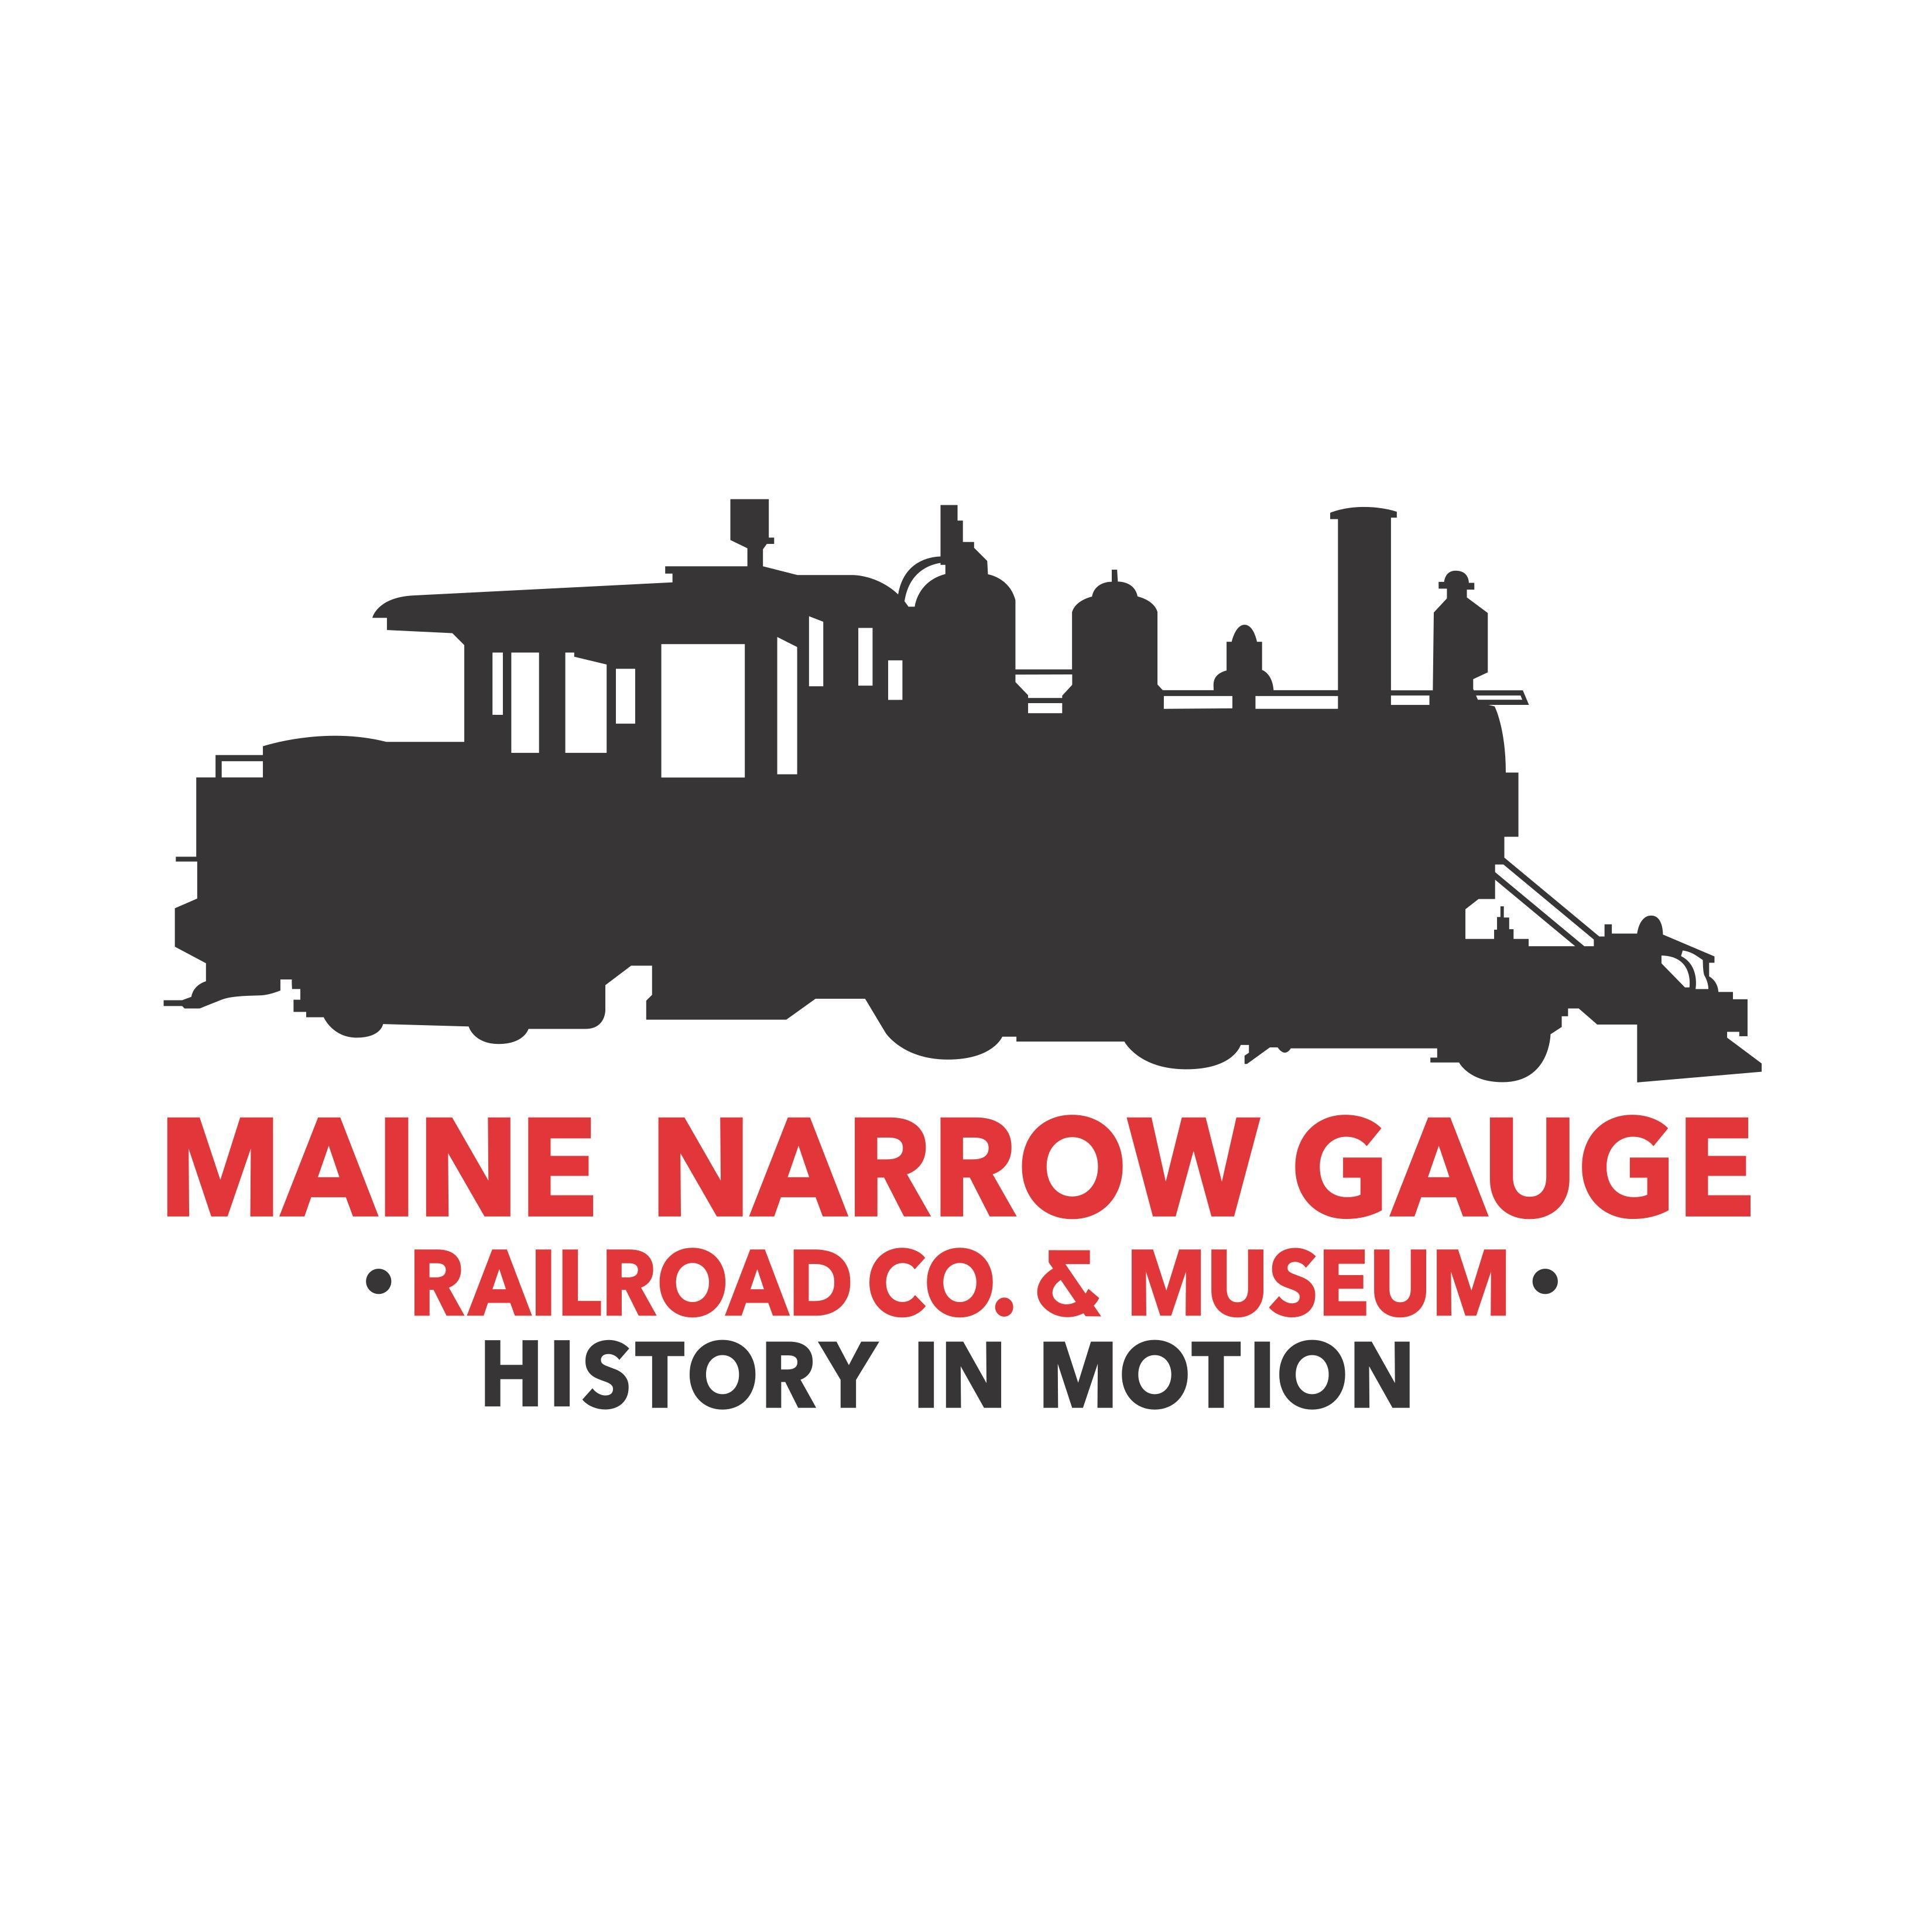 Maine Narrow Gauge Railroad Co. & Museum